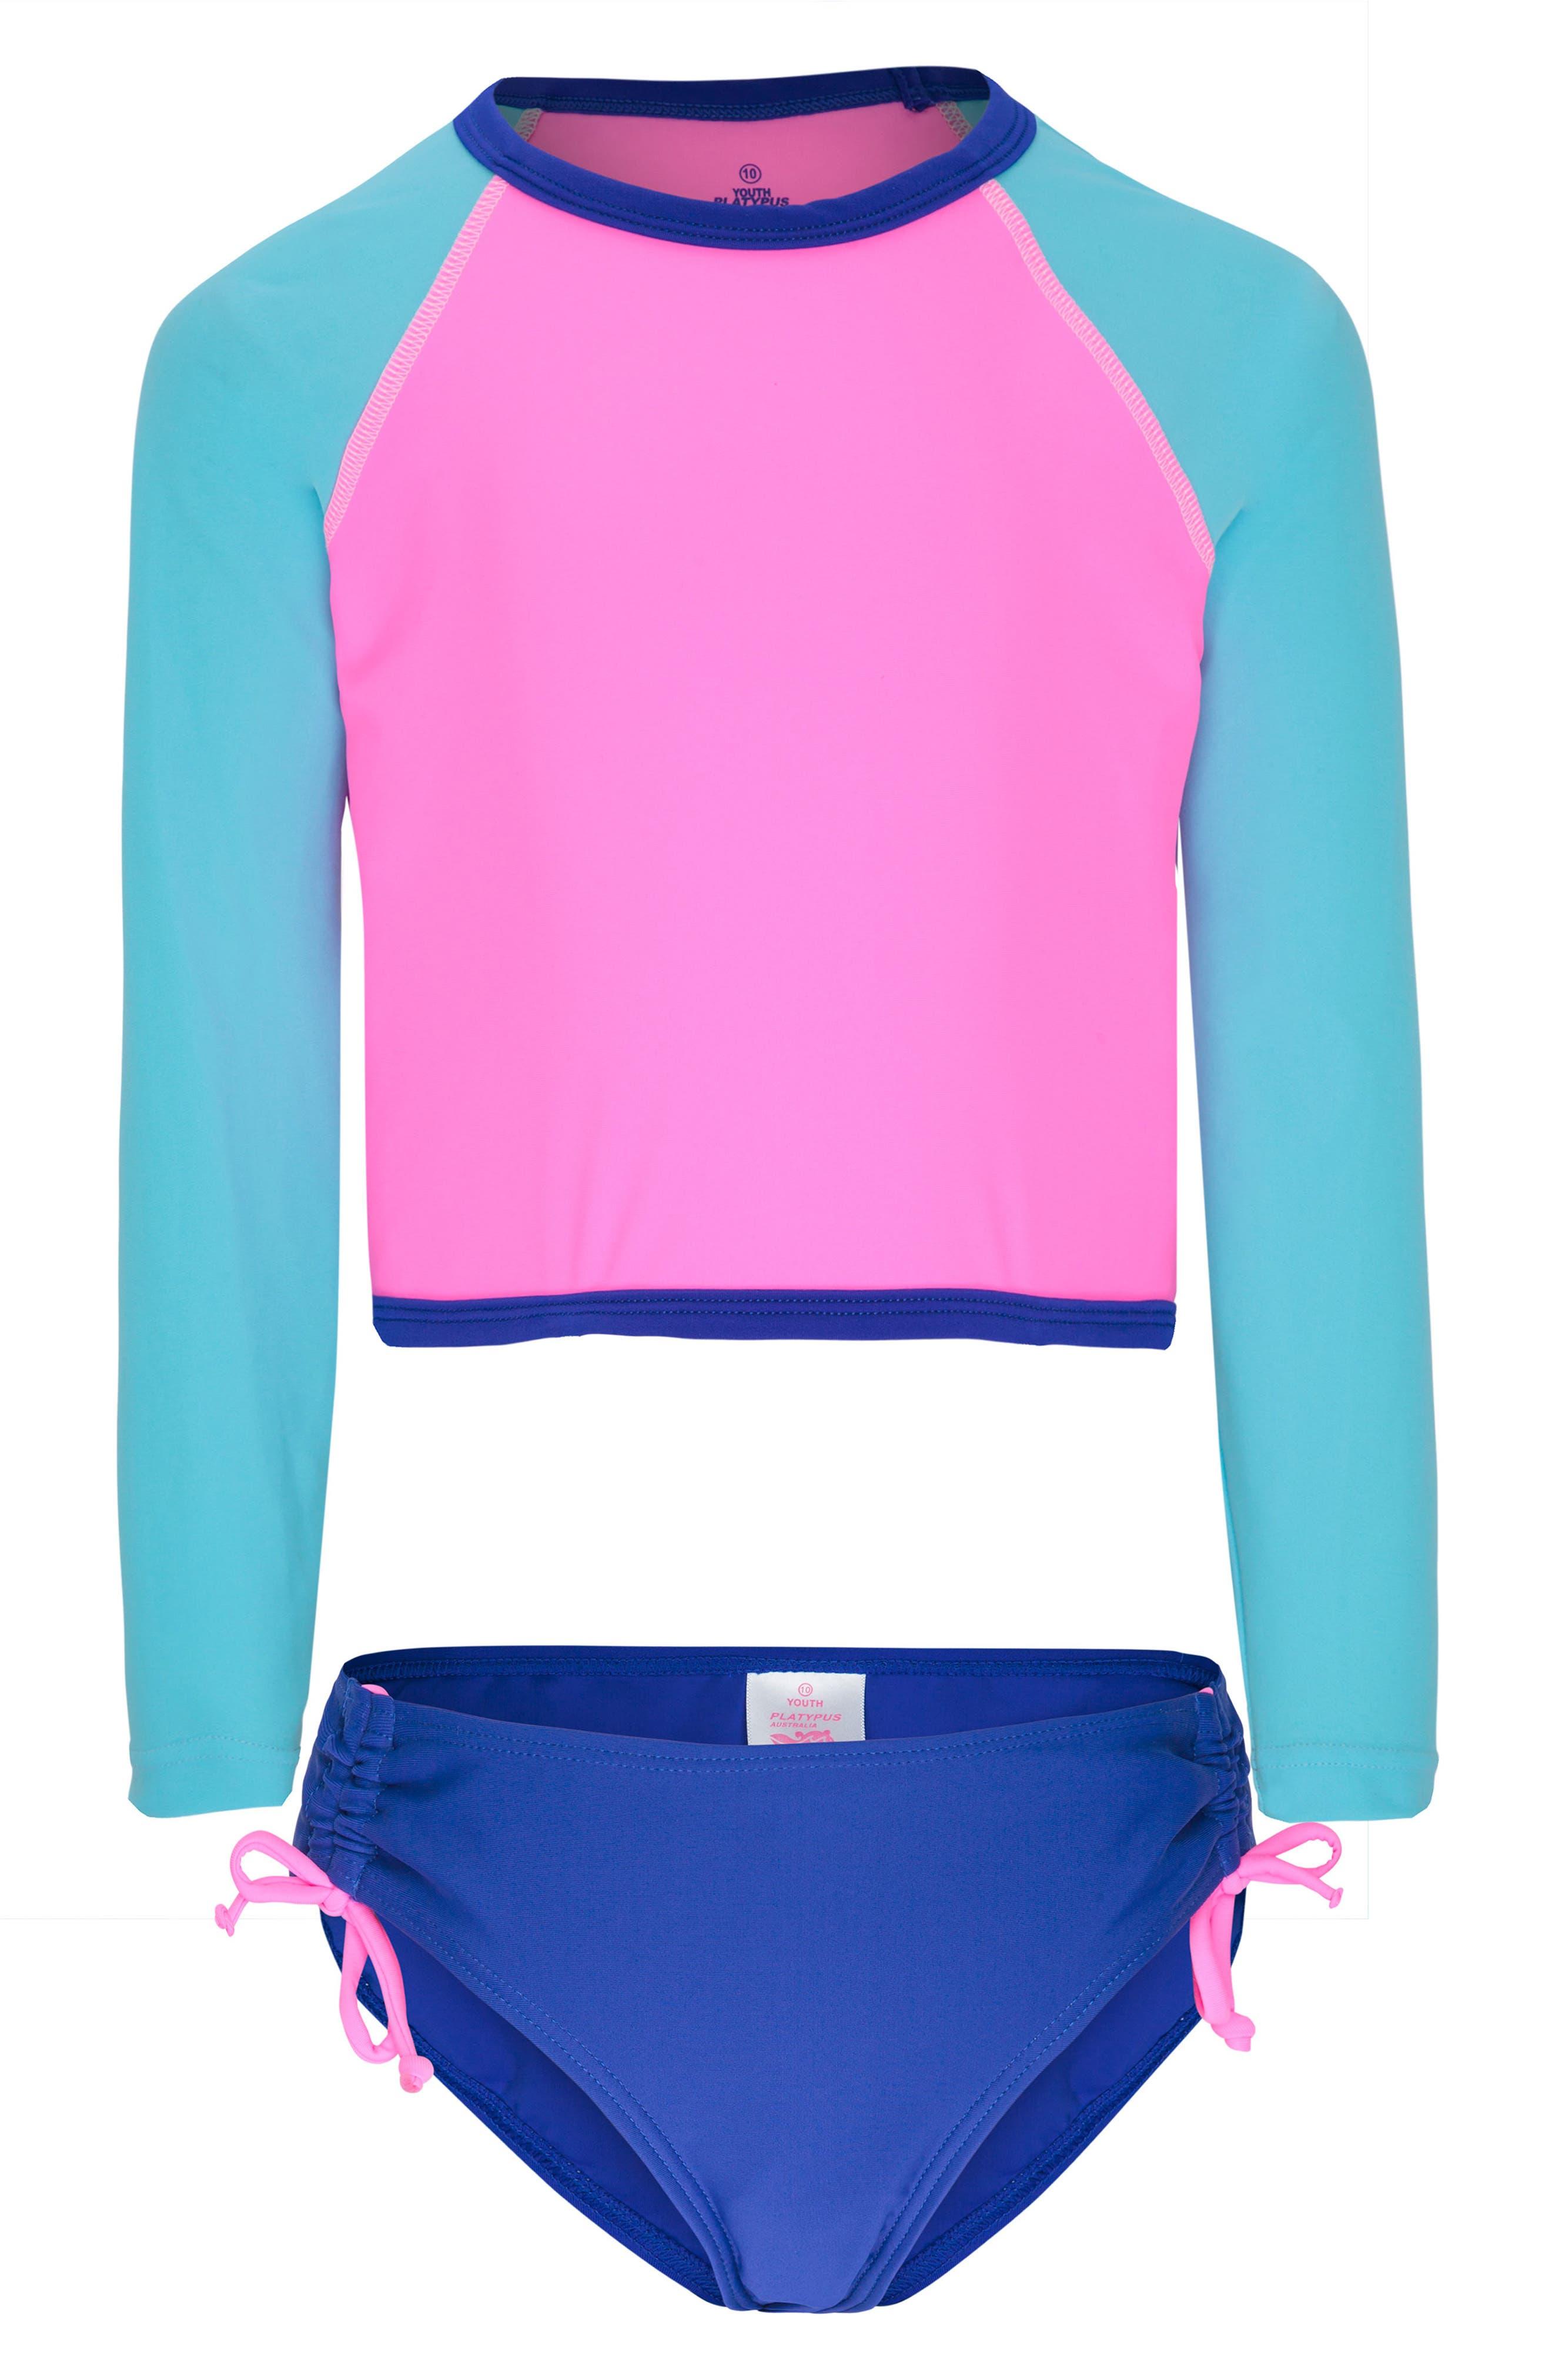 Girls Platypus Australia Colorblock TwoPiece Rashguard Swimsuit Size 8  Pink